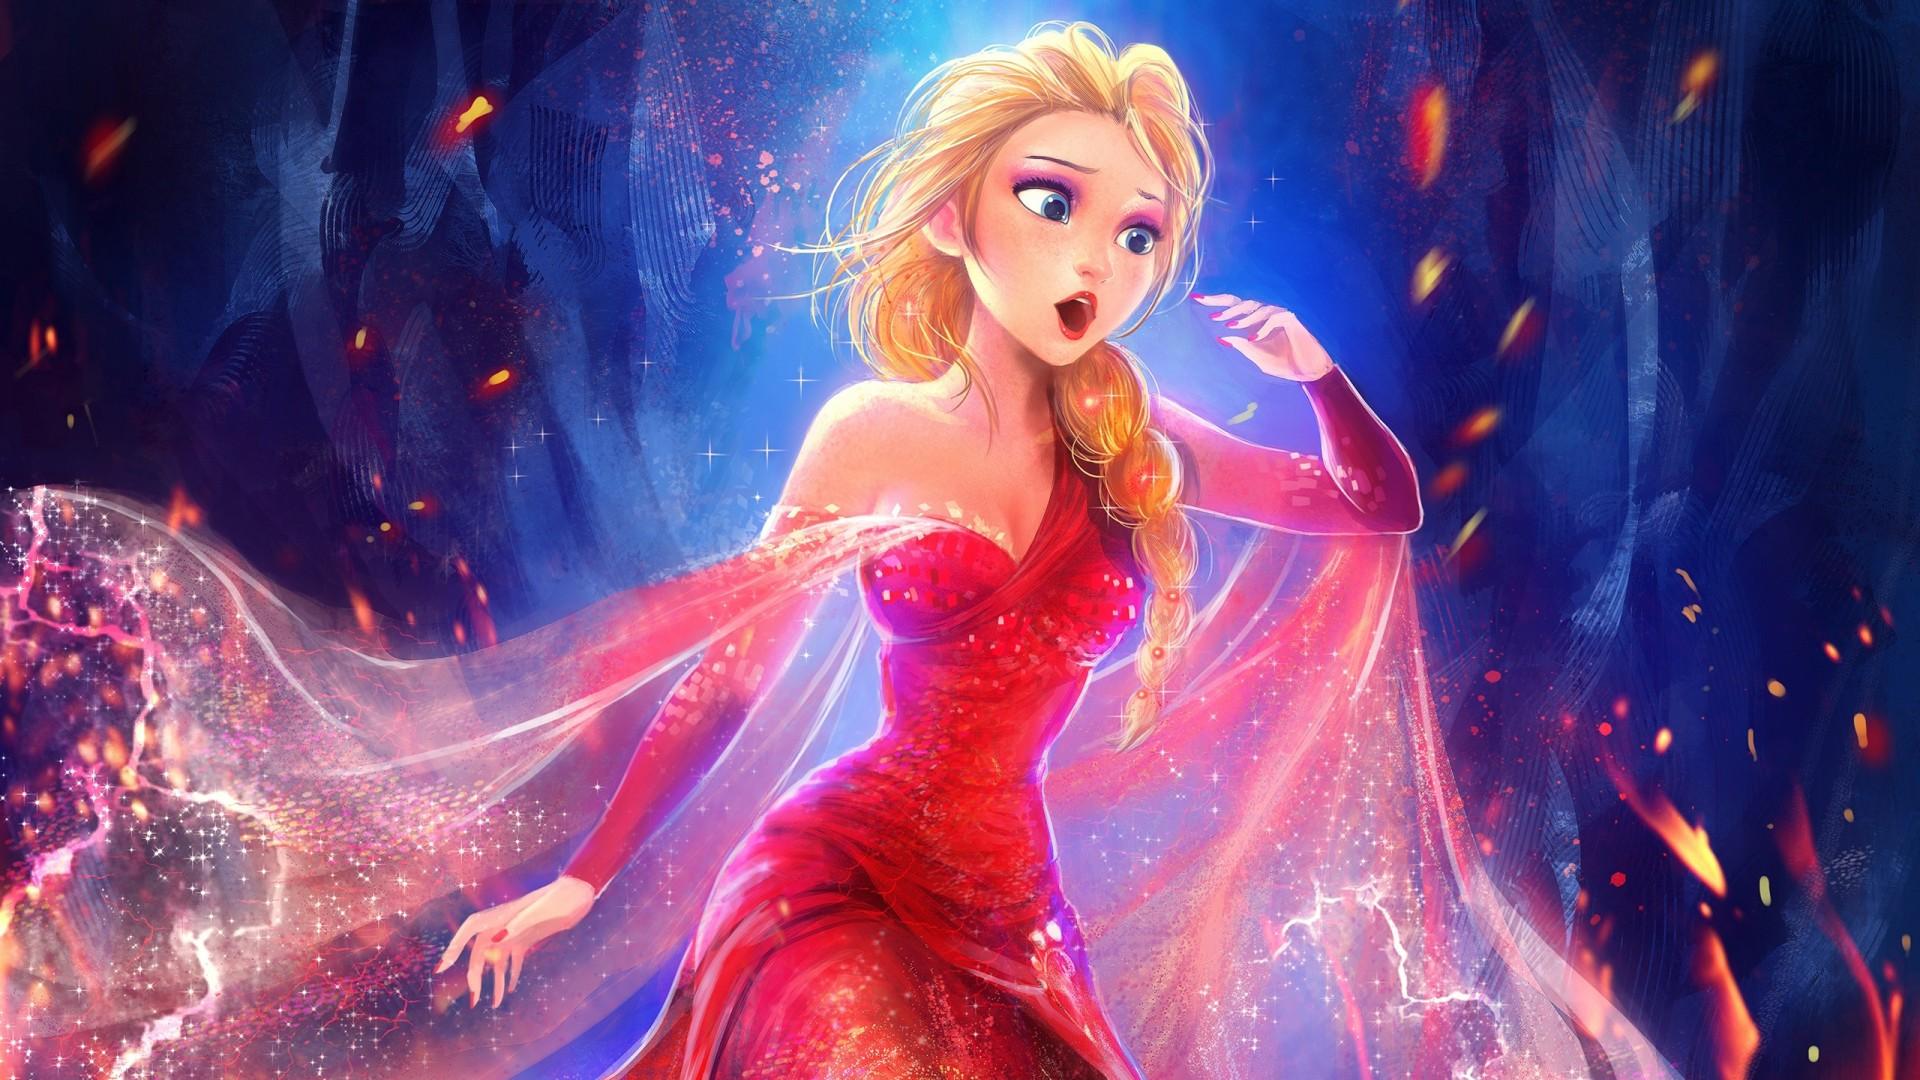 Cute Girl Iphone 6 Wallpaper Queen Elsa Wallpapers Hd Wallpapers Id 19007